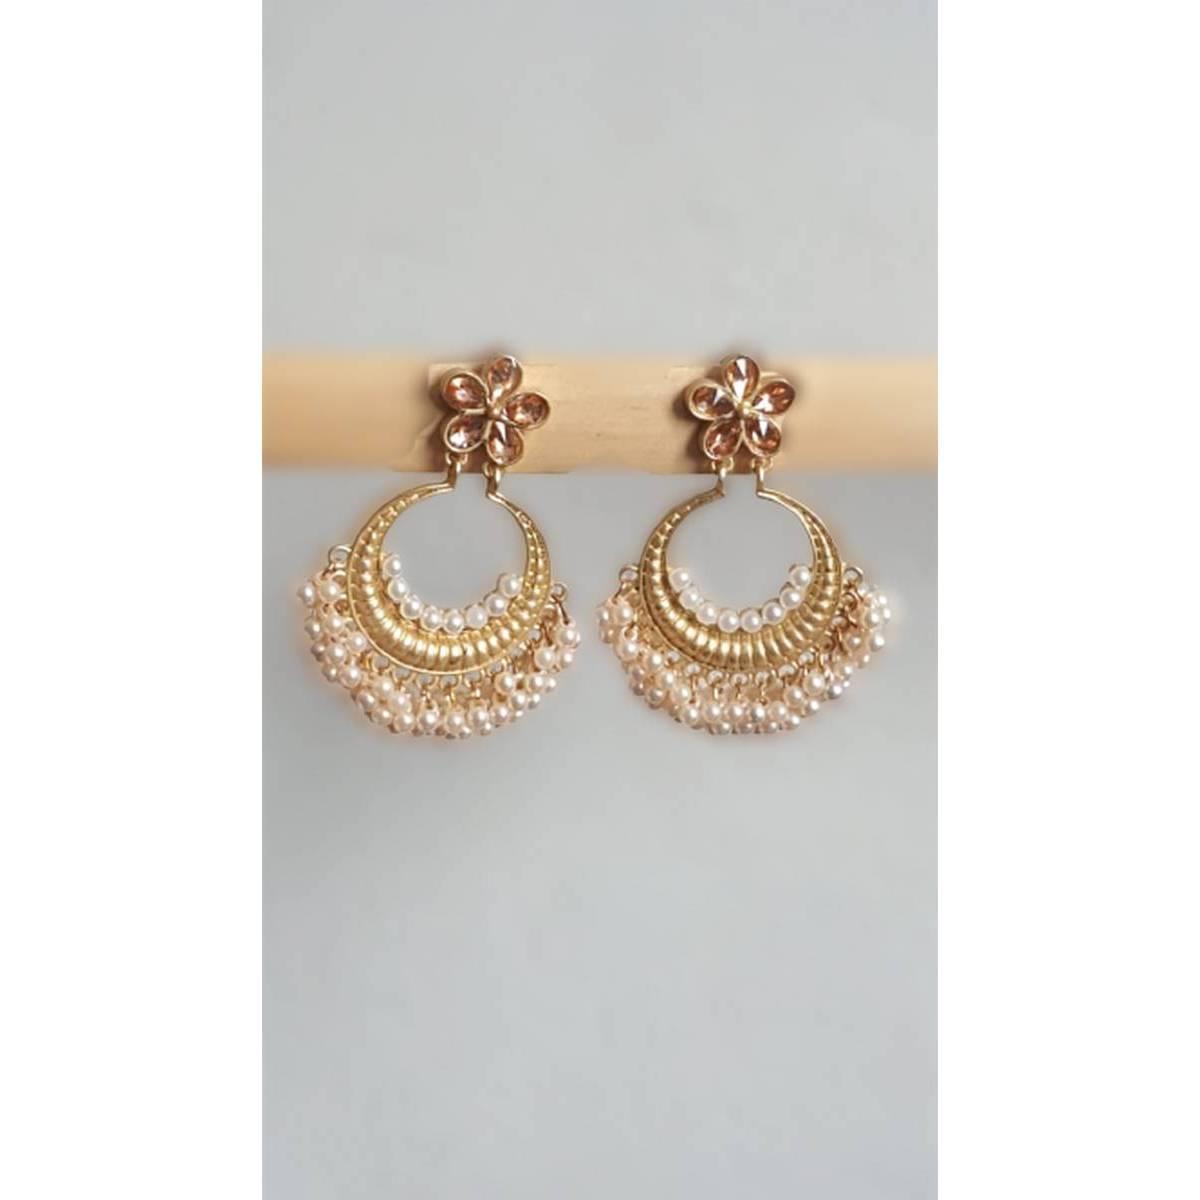 Fashion Infinity Indian Bohemian Design Trendy Jewelry Earrings For Women